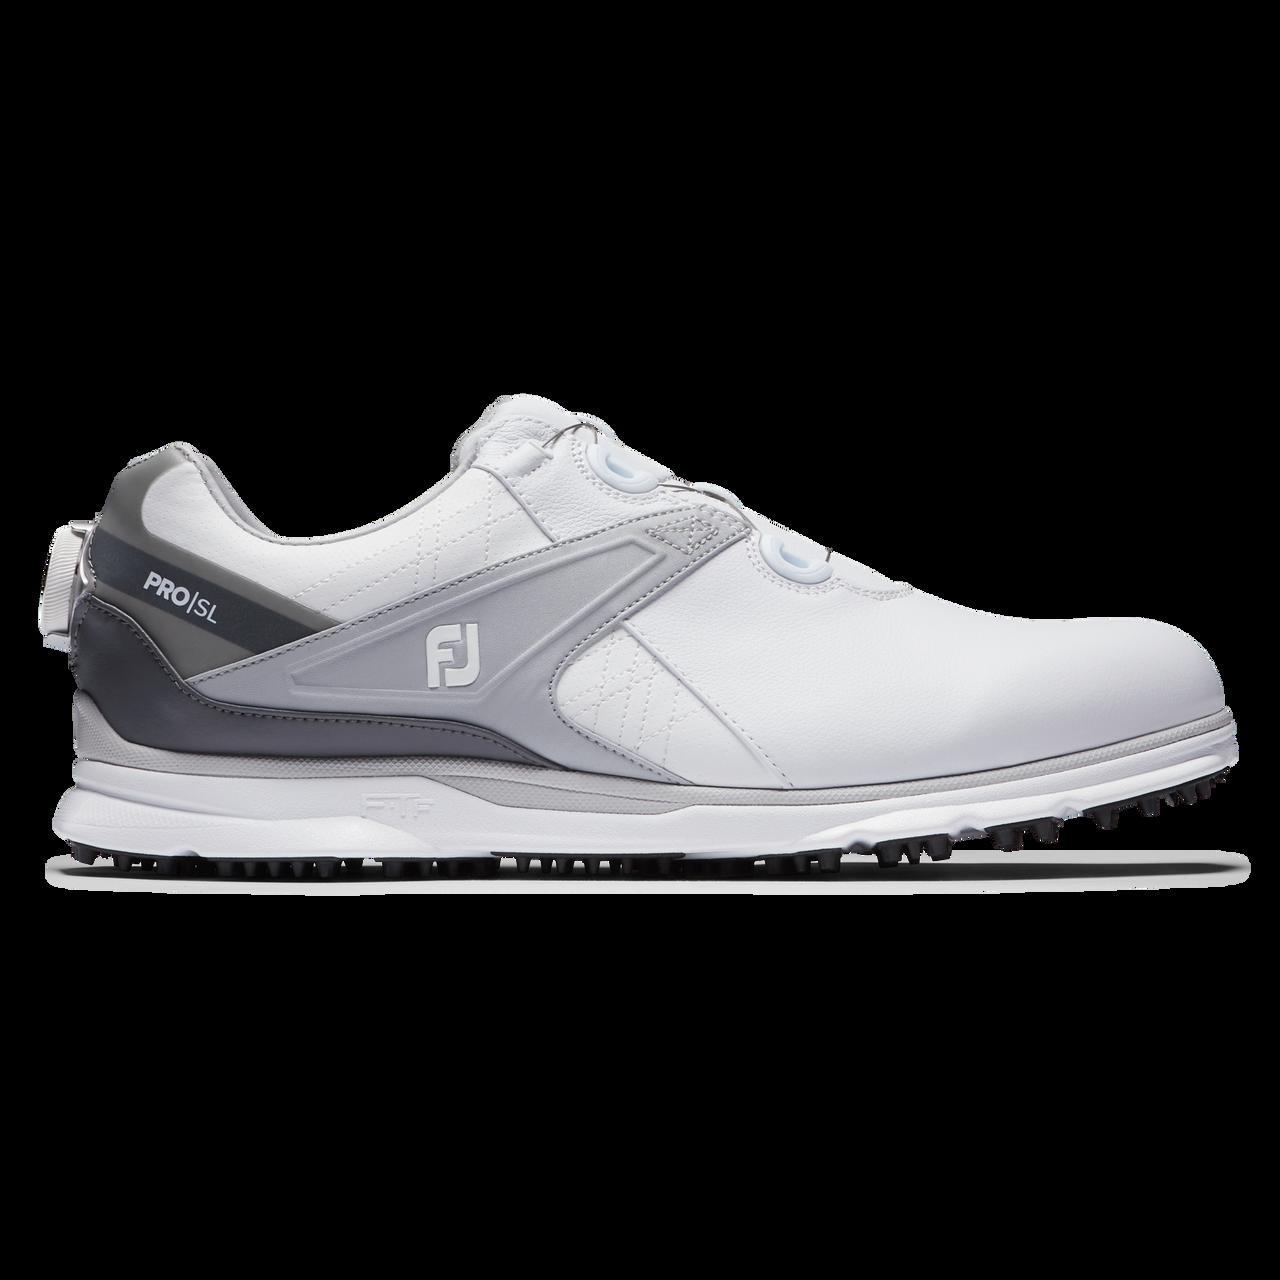 FootJoy Pro SL BOA Men's Golf Shoes (2020)